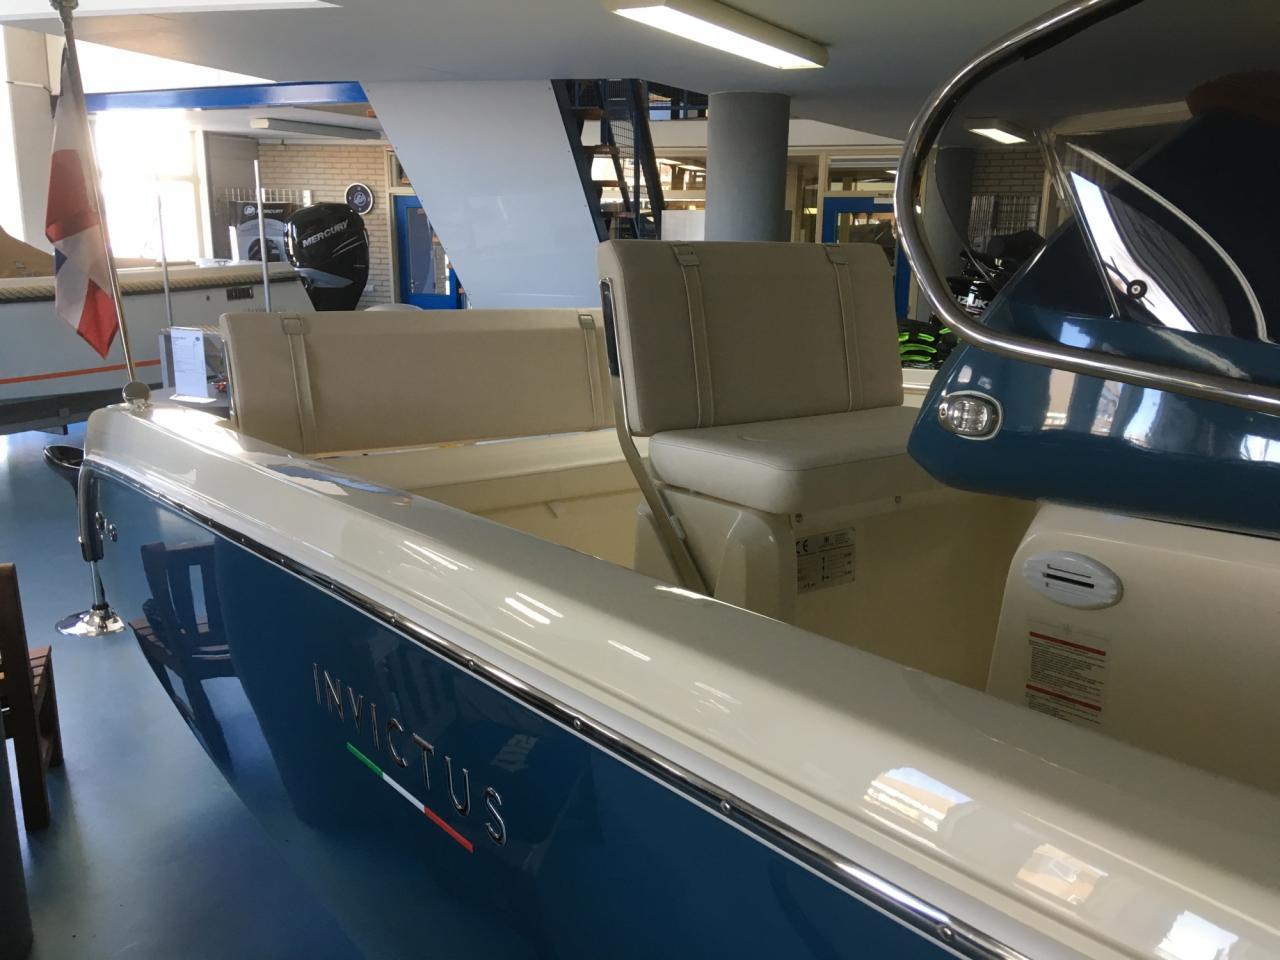 Invictus 200 fx blue whale met Suzuki 140 pk 14